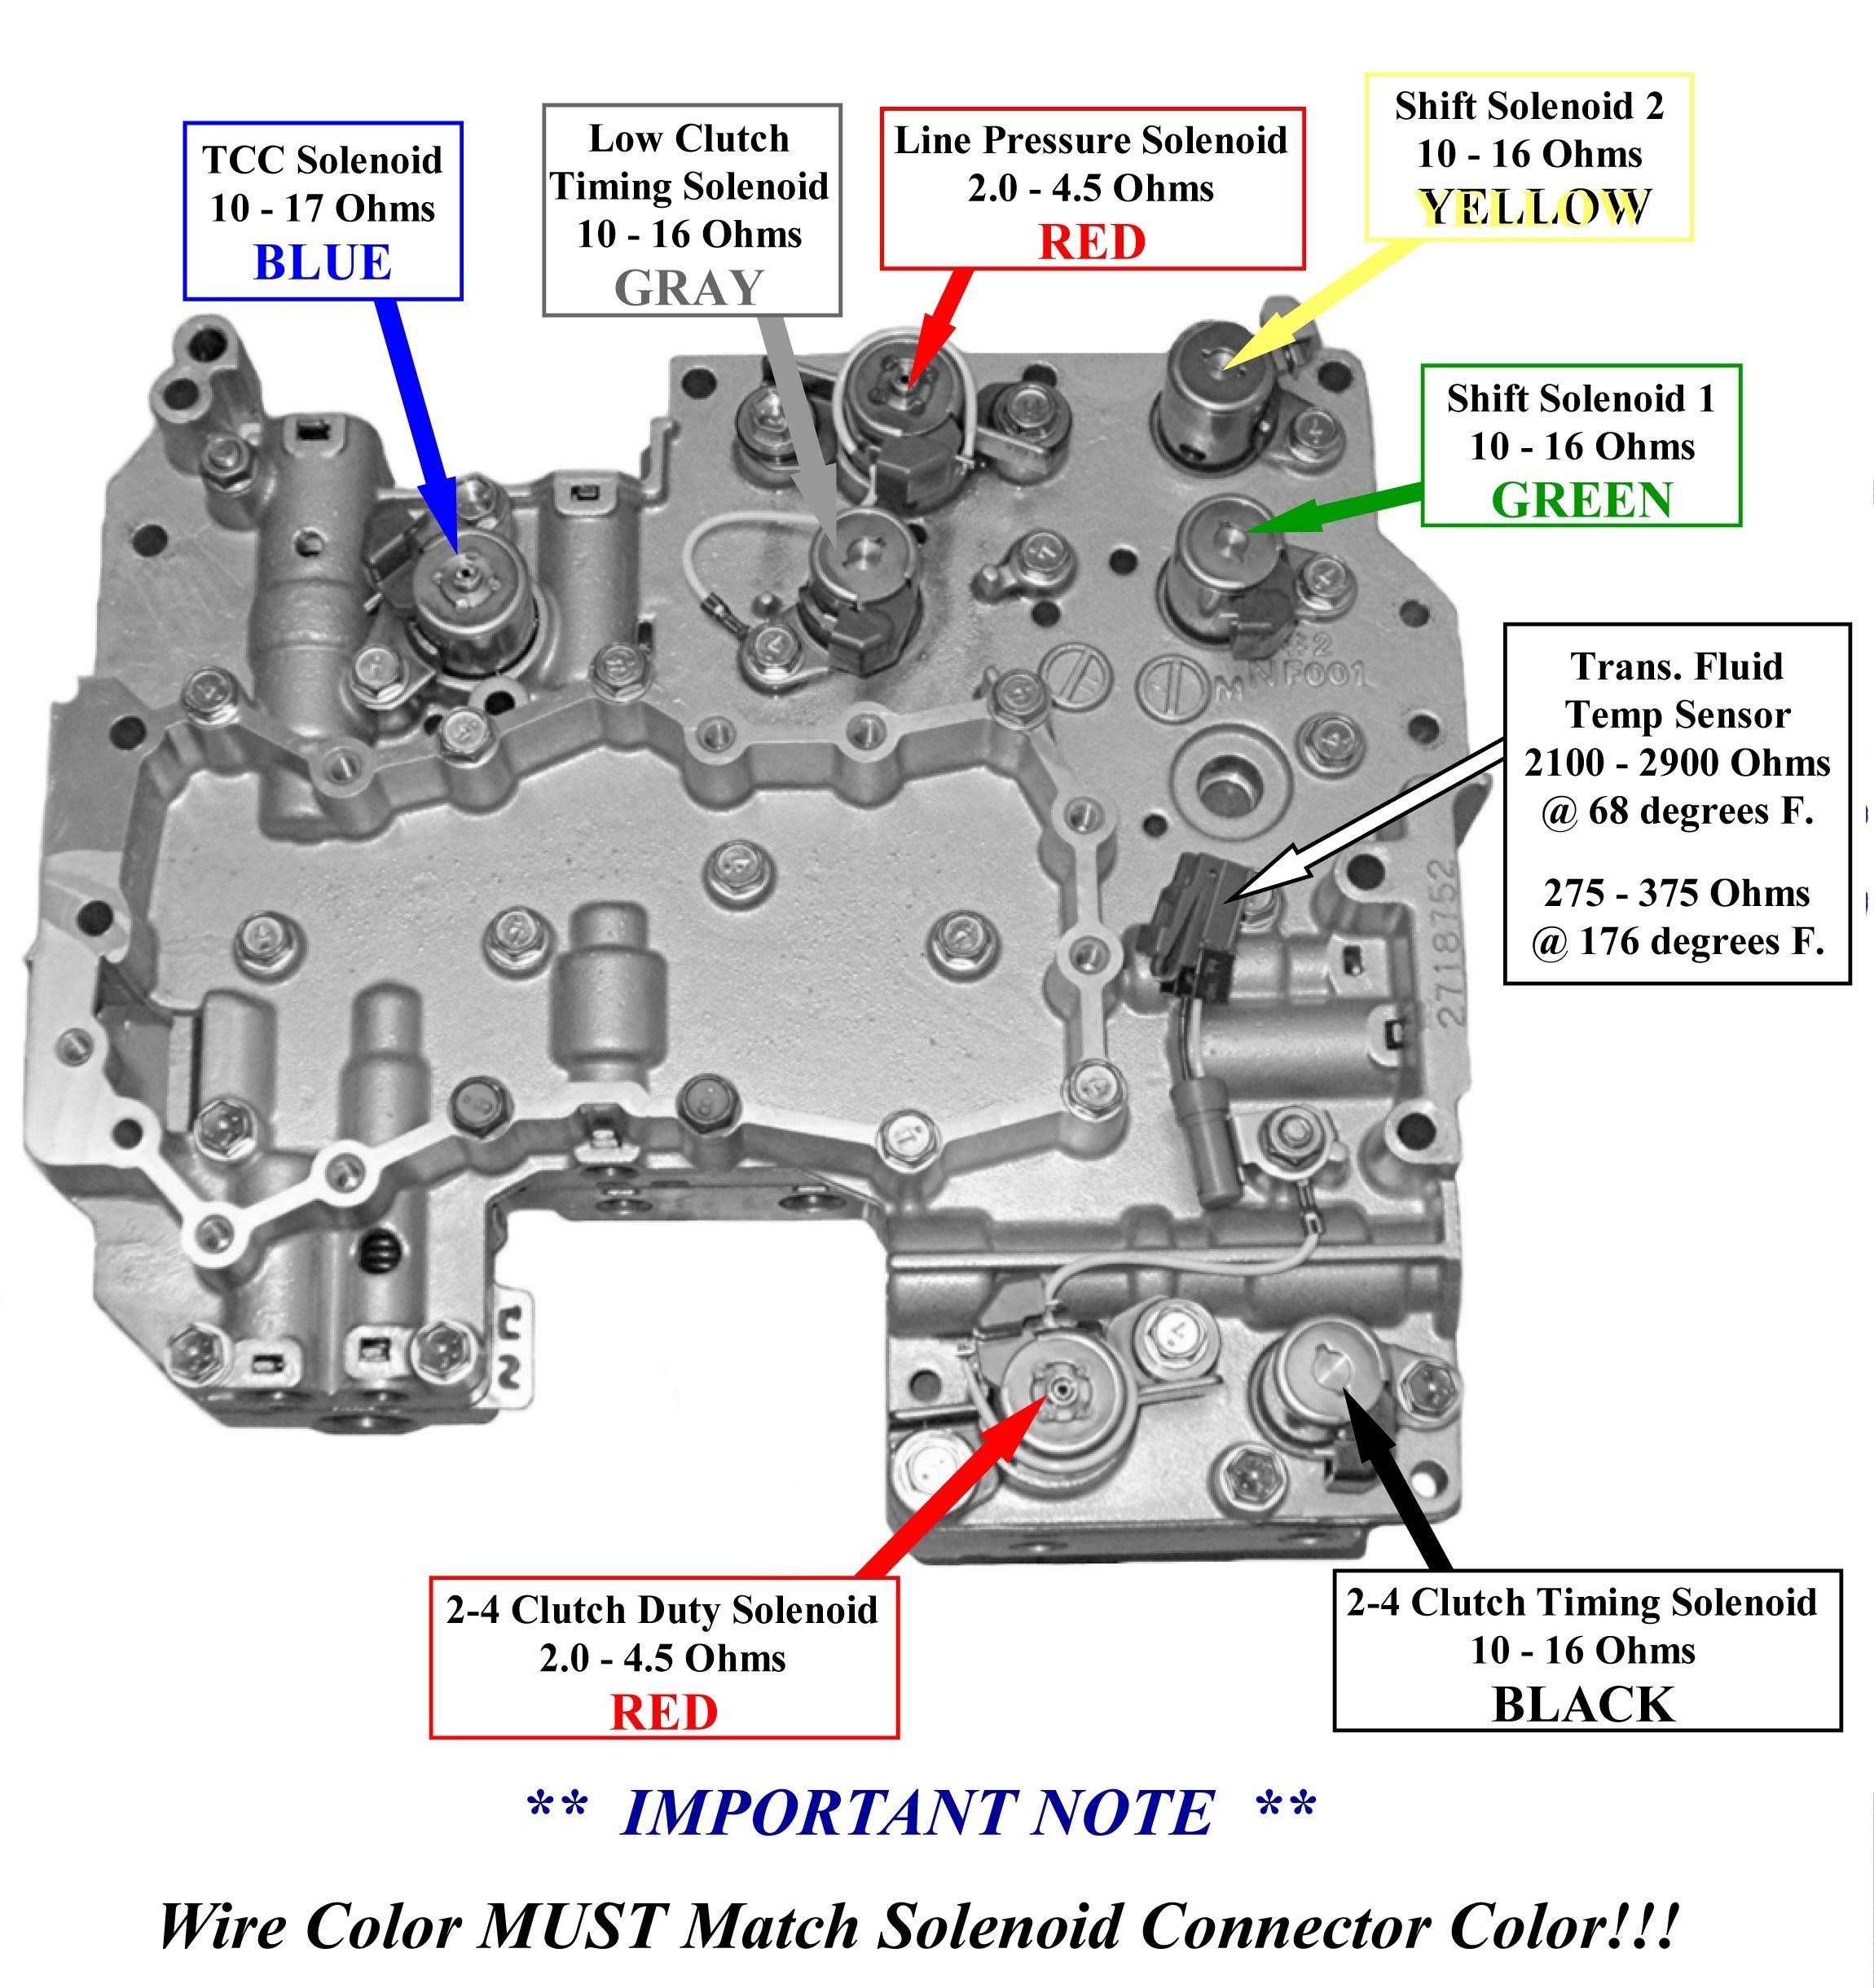 gm 4l30e wiring diagram 4l30e wiring diagram e1 wiring diagram  4l30e wiring diagram e1 wiring diagram